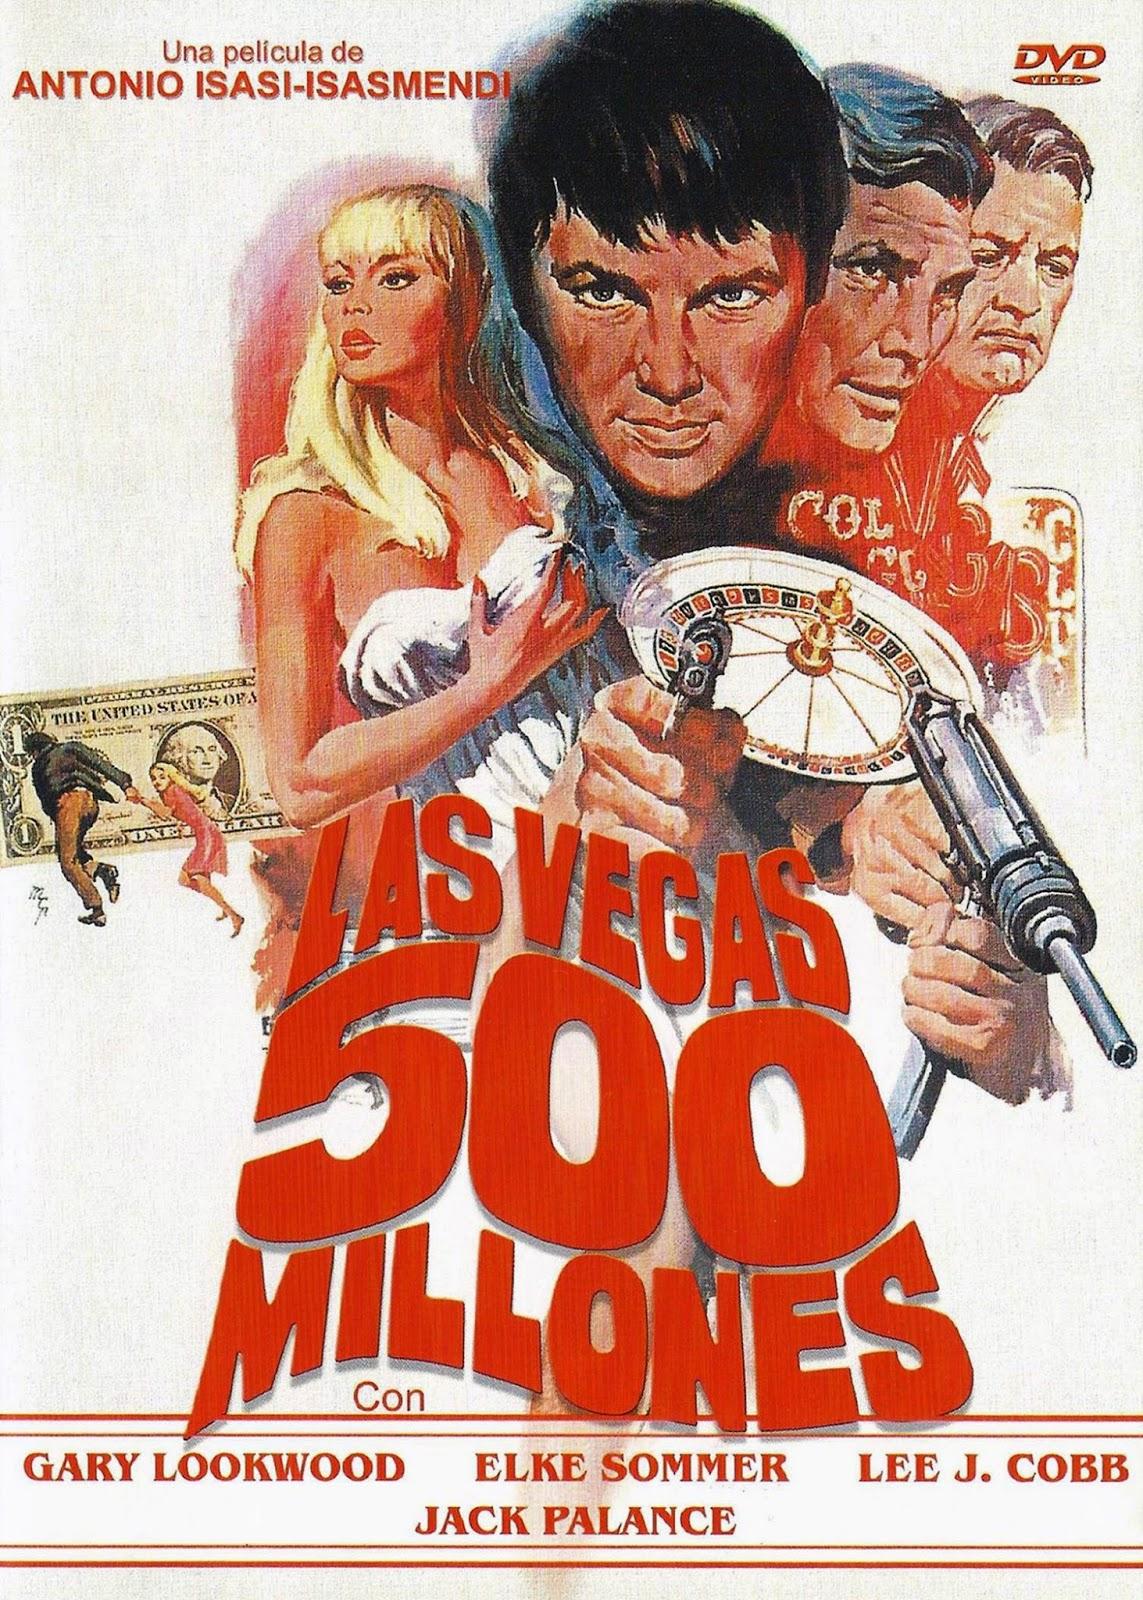 Las Vegas 500 Millones (1968)